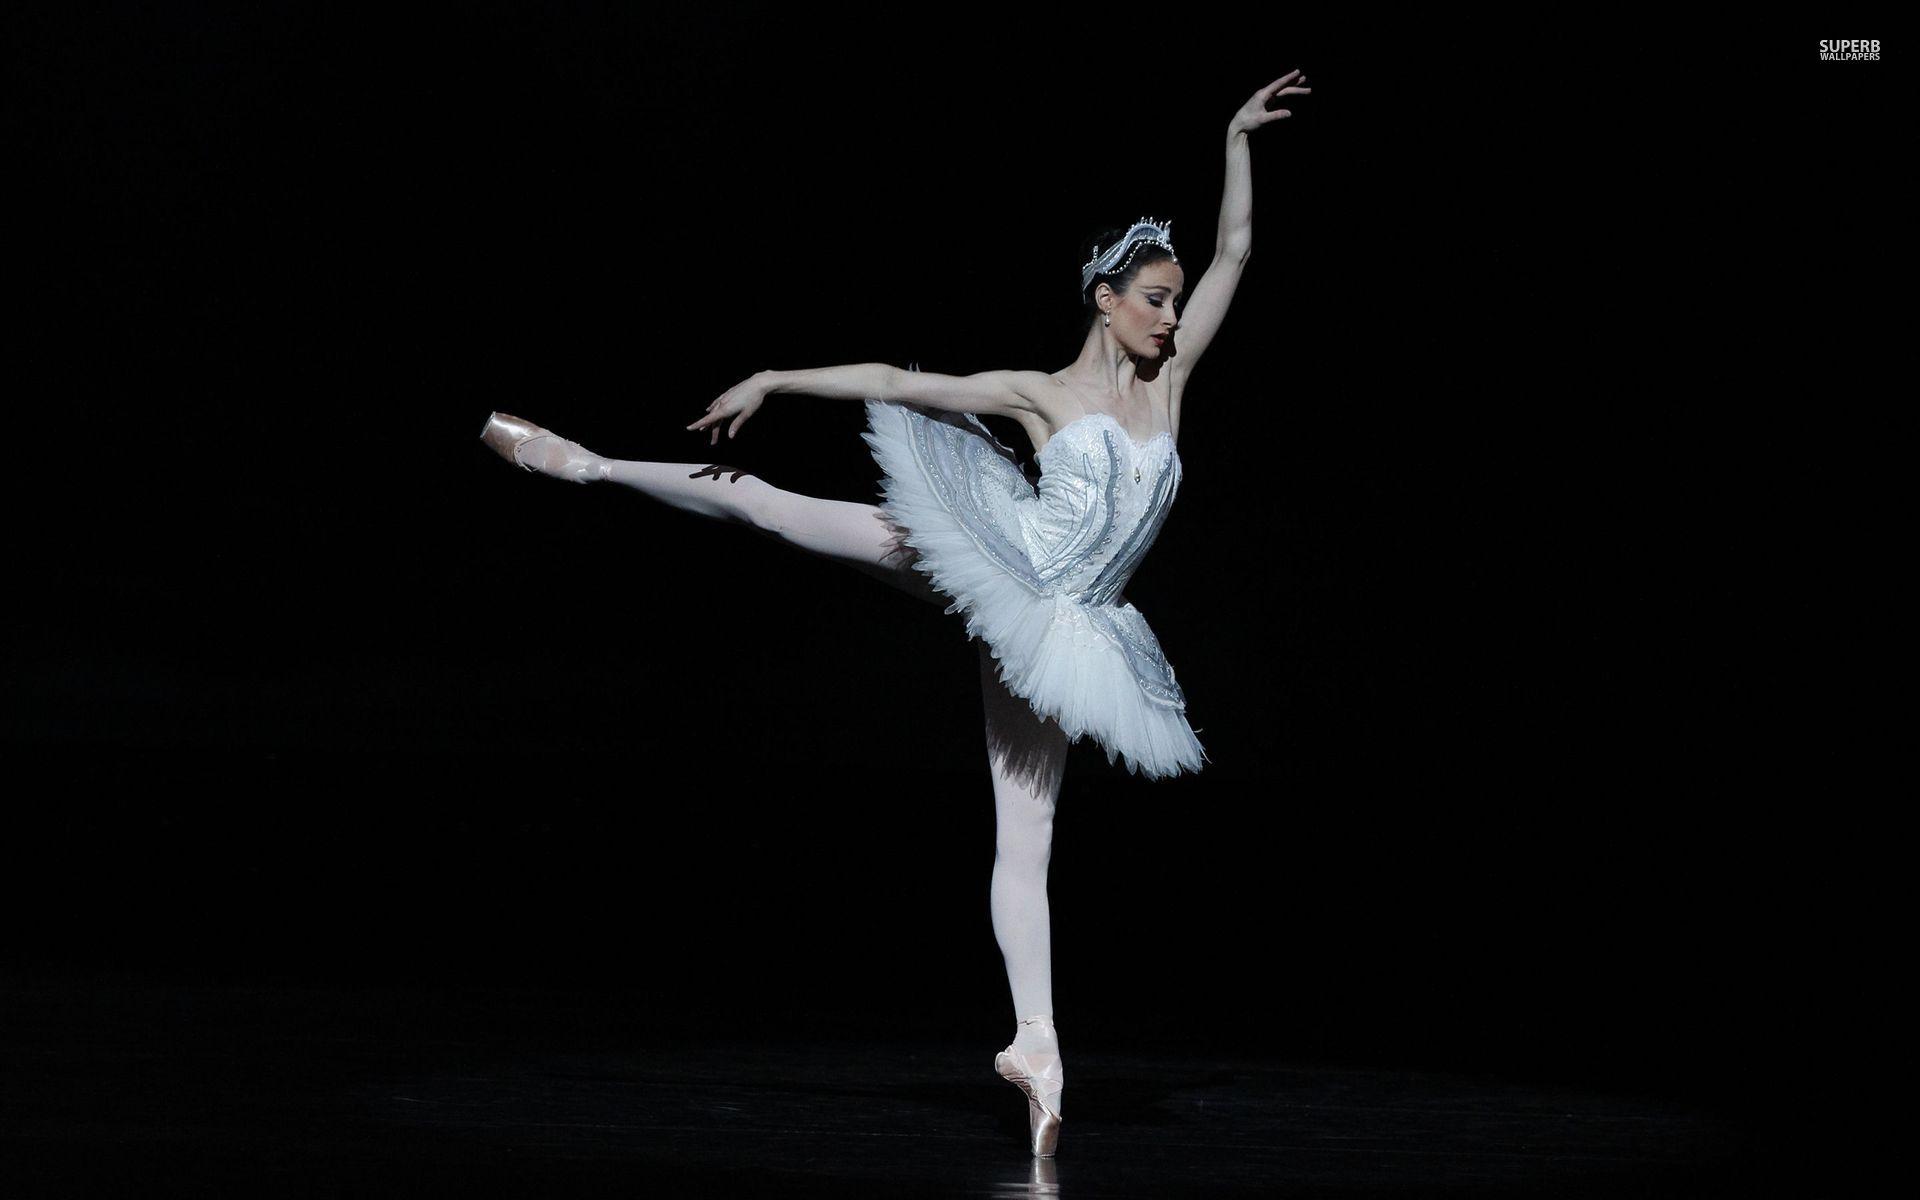 Ballerina Wallpapers Artistic Hq Ballerina Pictures 4k Wallpapers 2019